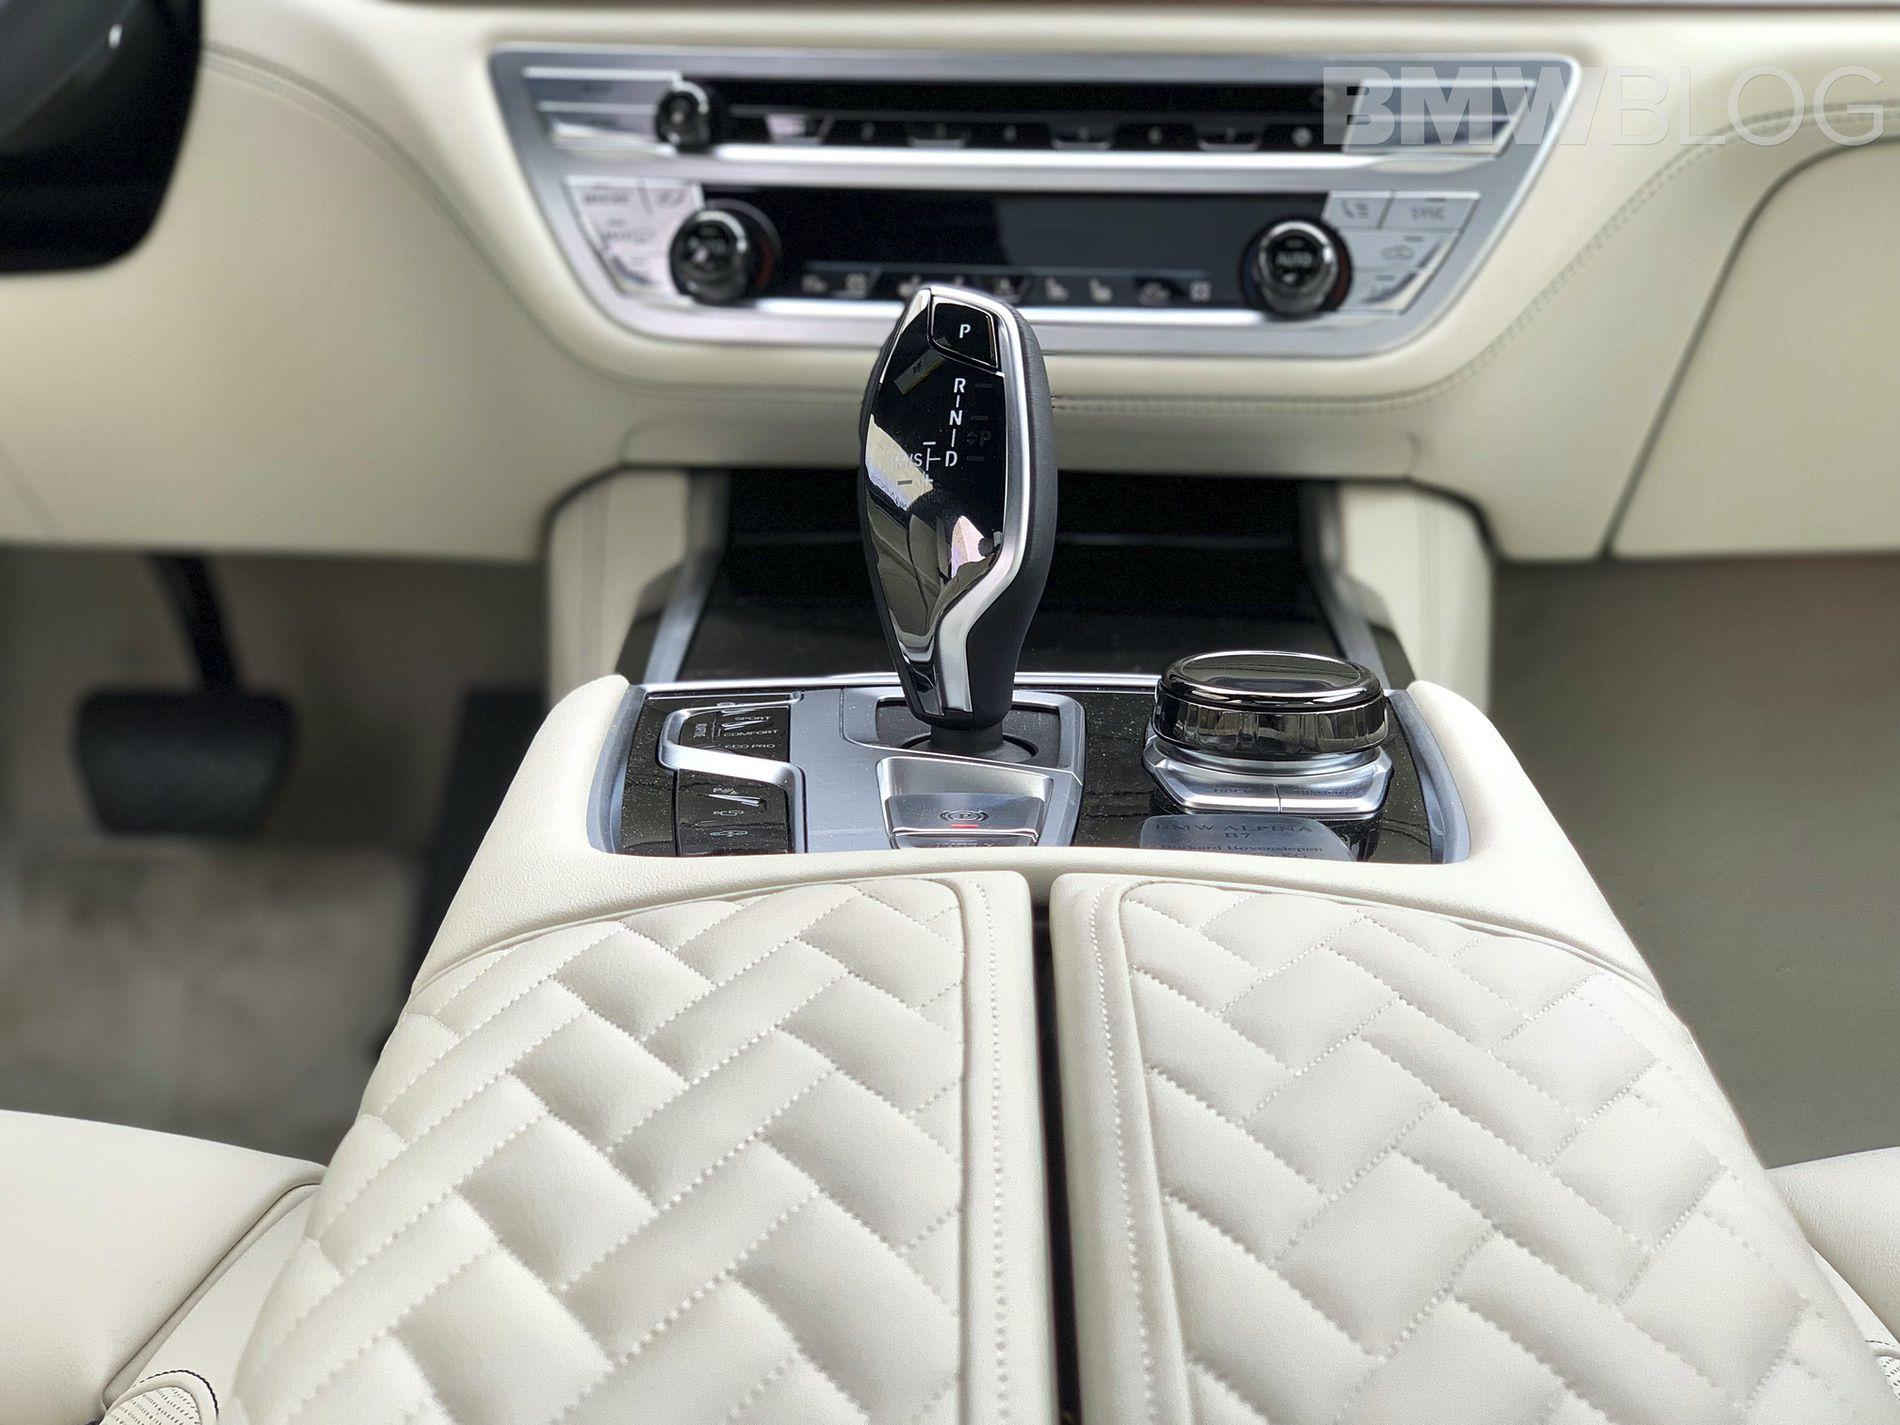 2019 - [BMW] Série 7 restylée  - Page 12 2020-ALPINA-B7-Facelift-11